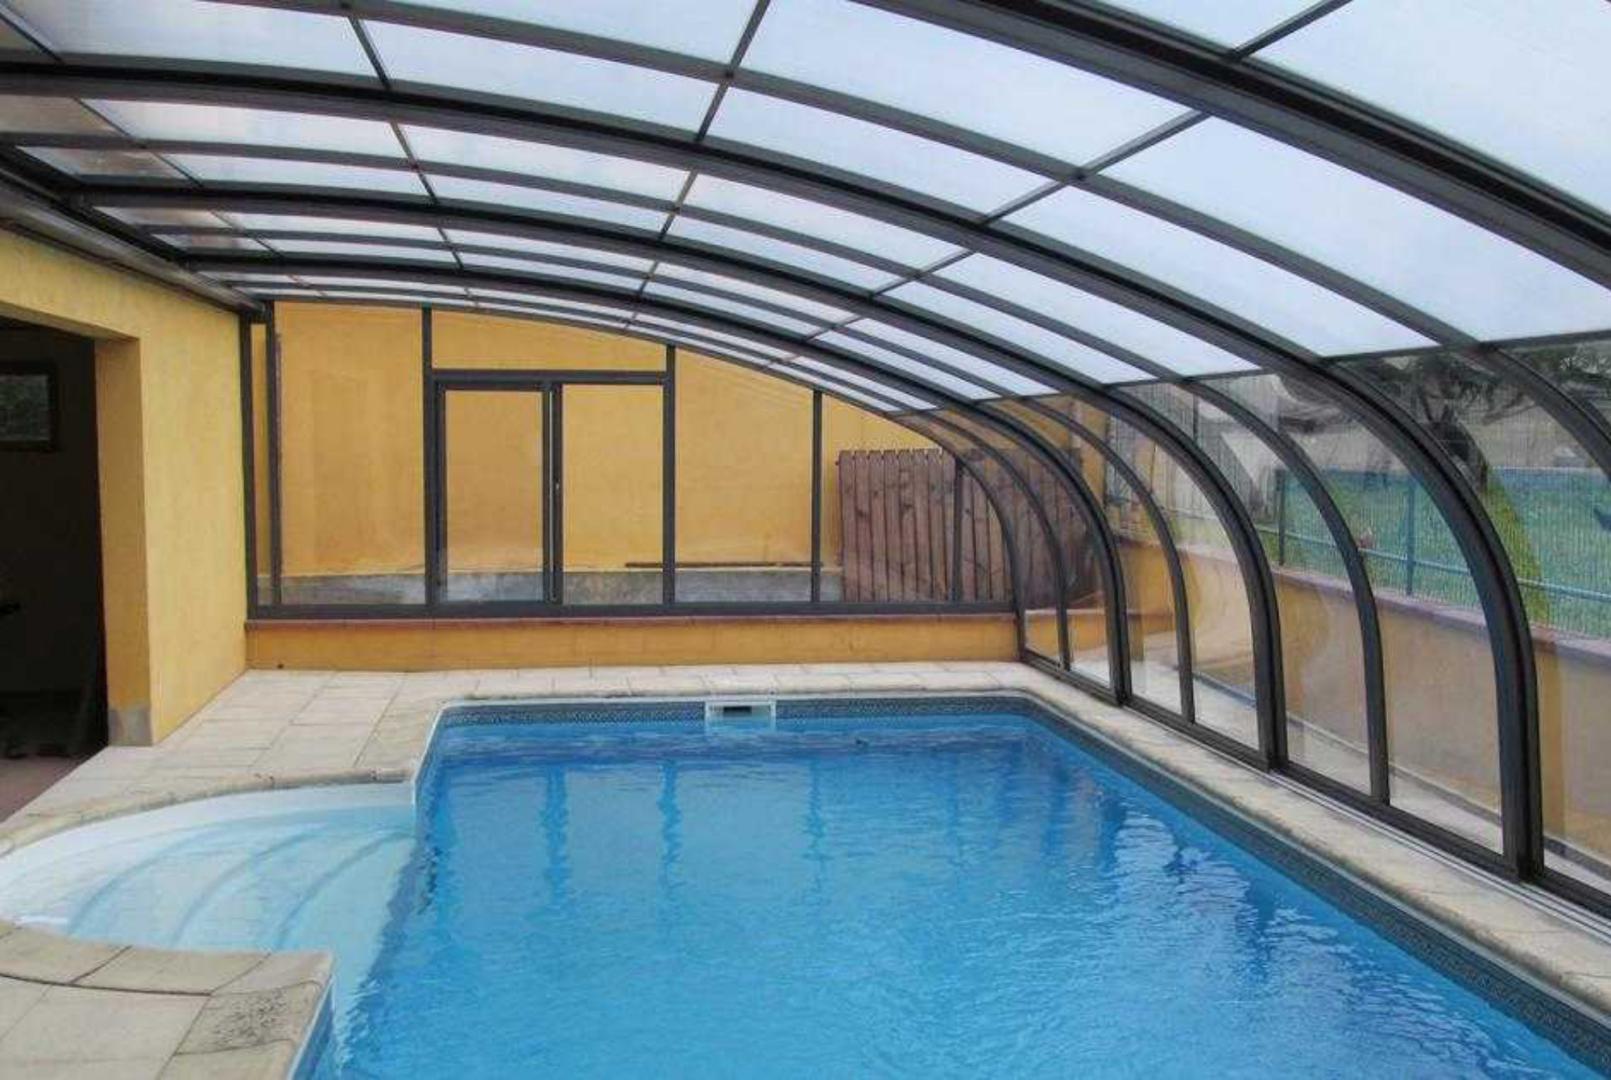 abri piscine adoss maison excellent location vacances. Black Bedroom Furniture Sets. Home Design Ideas